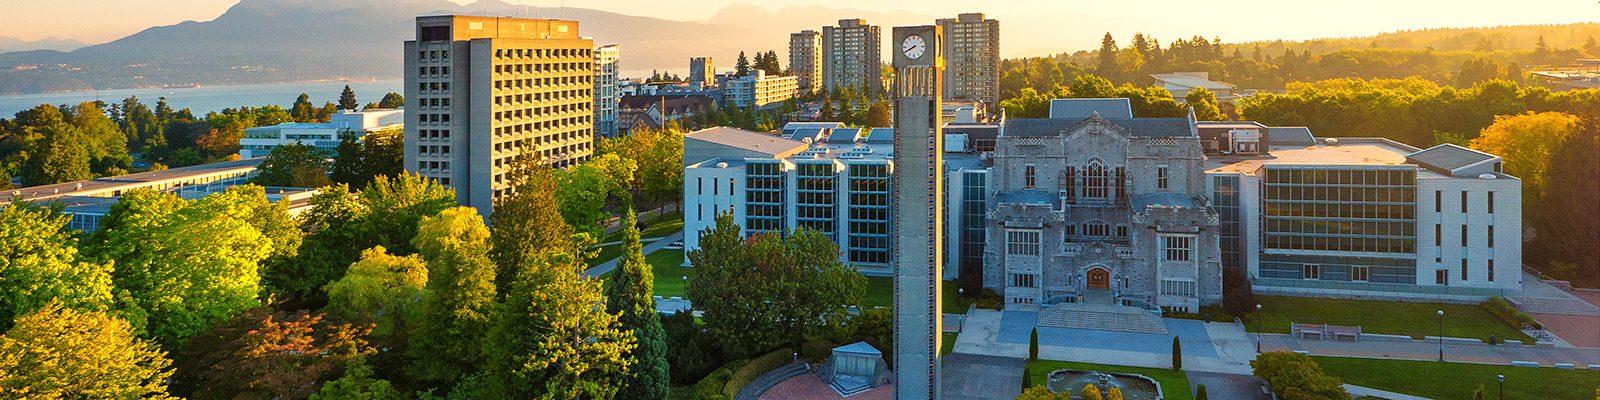 UBC Point Grey Clock Tower East Sunrise 1